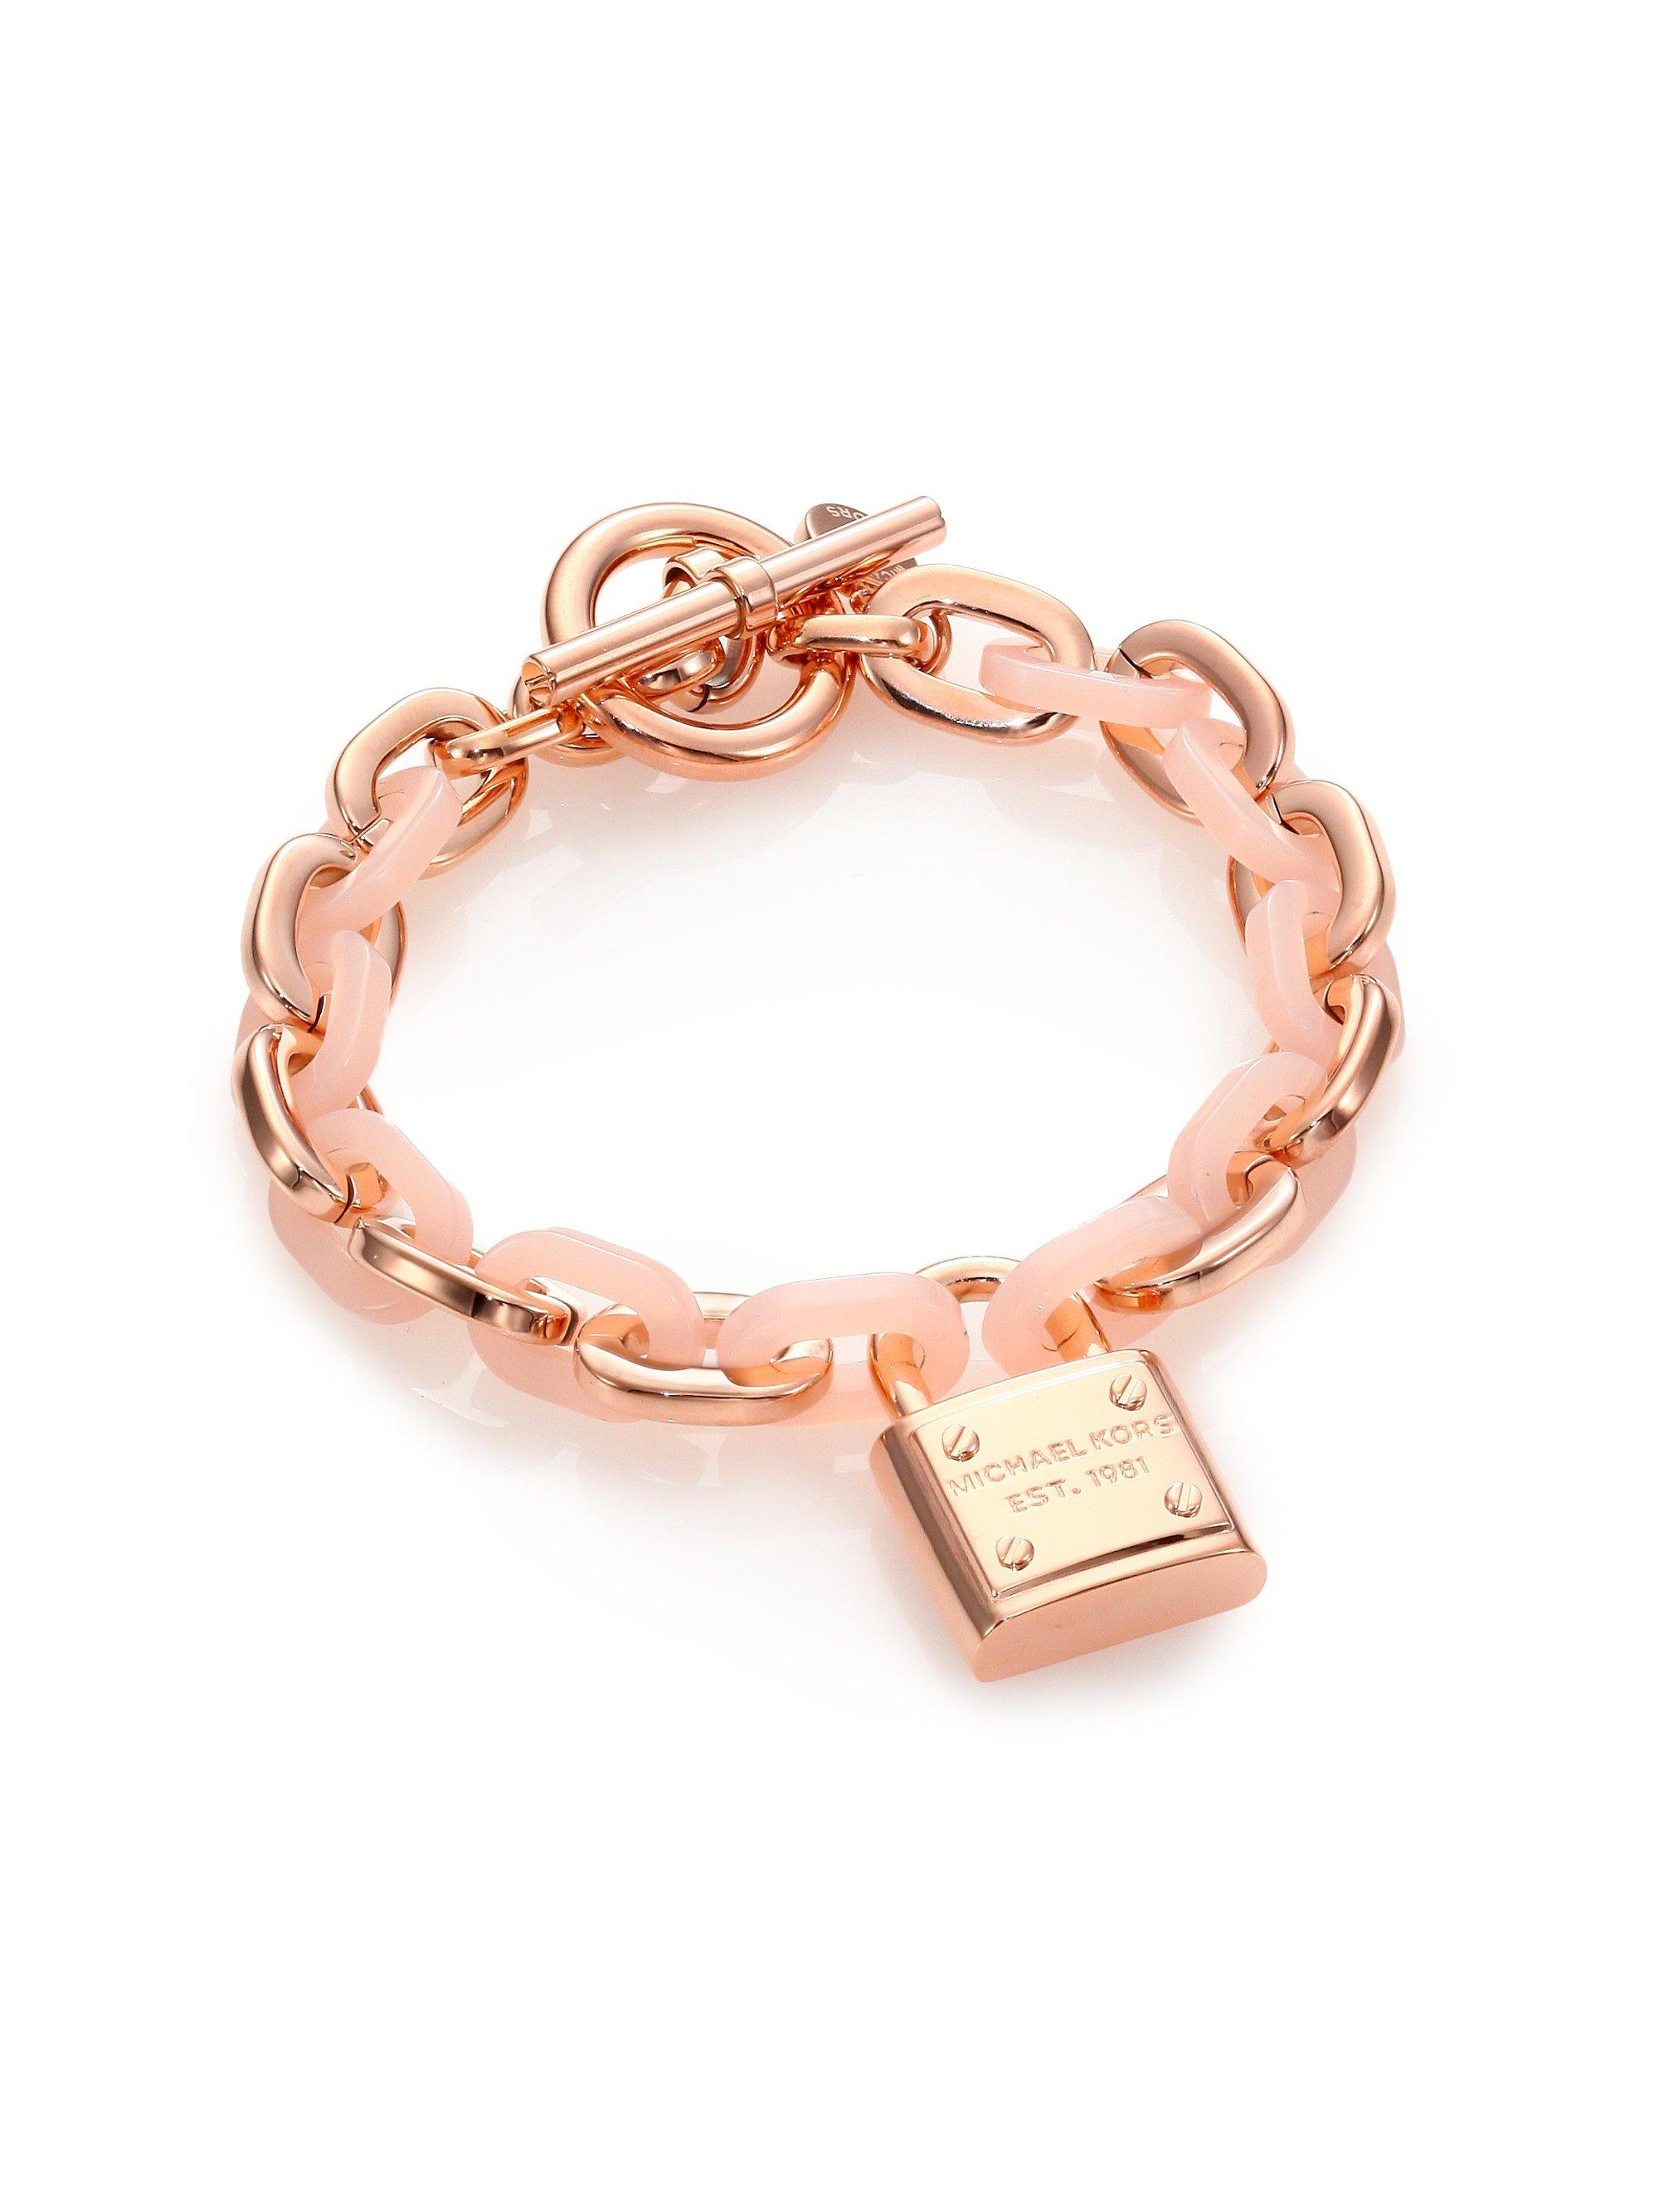 Michael kors Rose & Blush Padlock Charm Bracelet in Pink ...